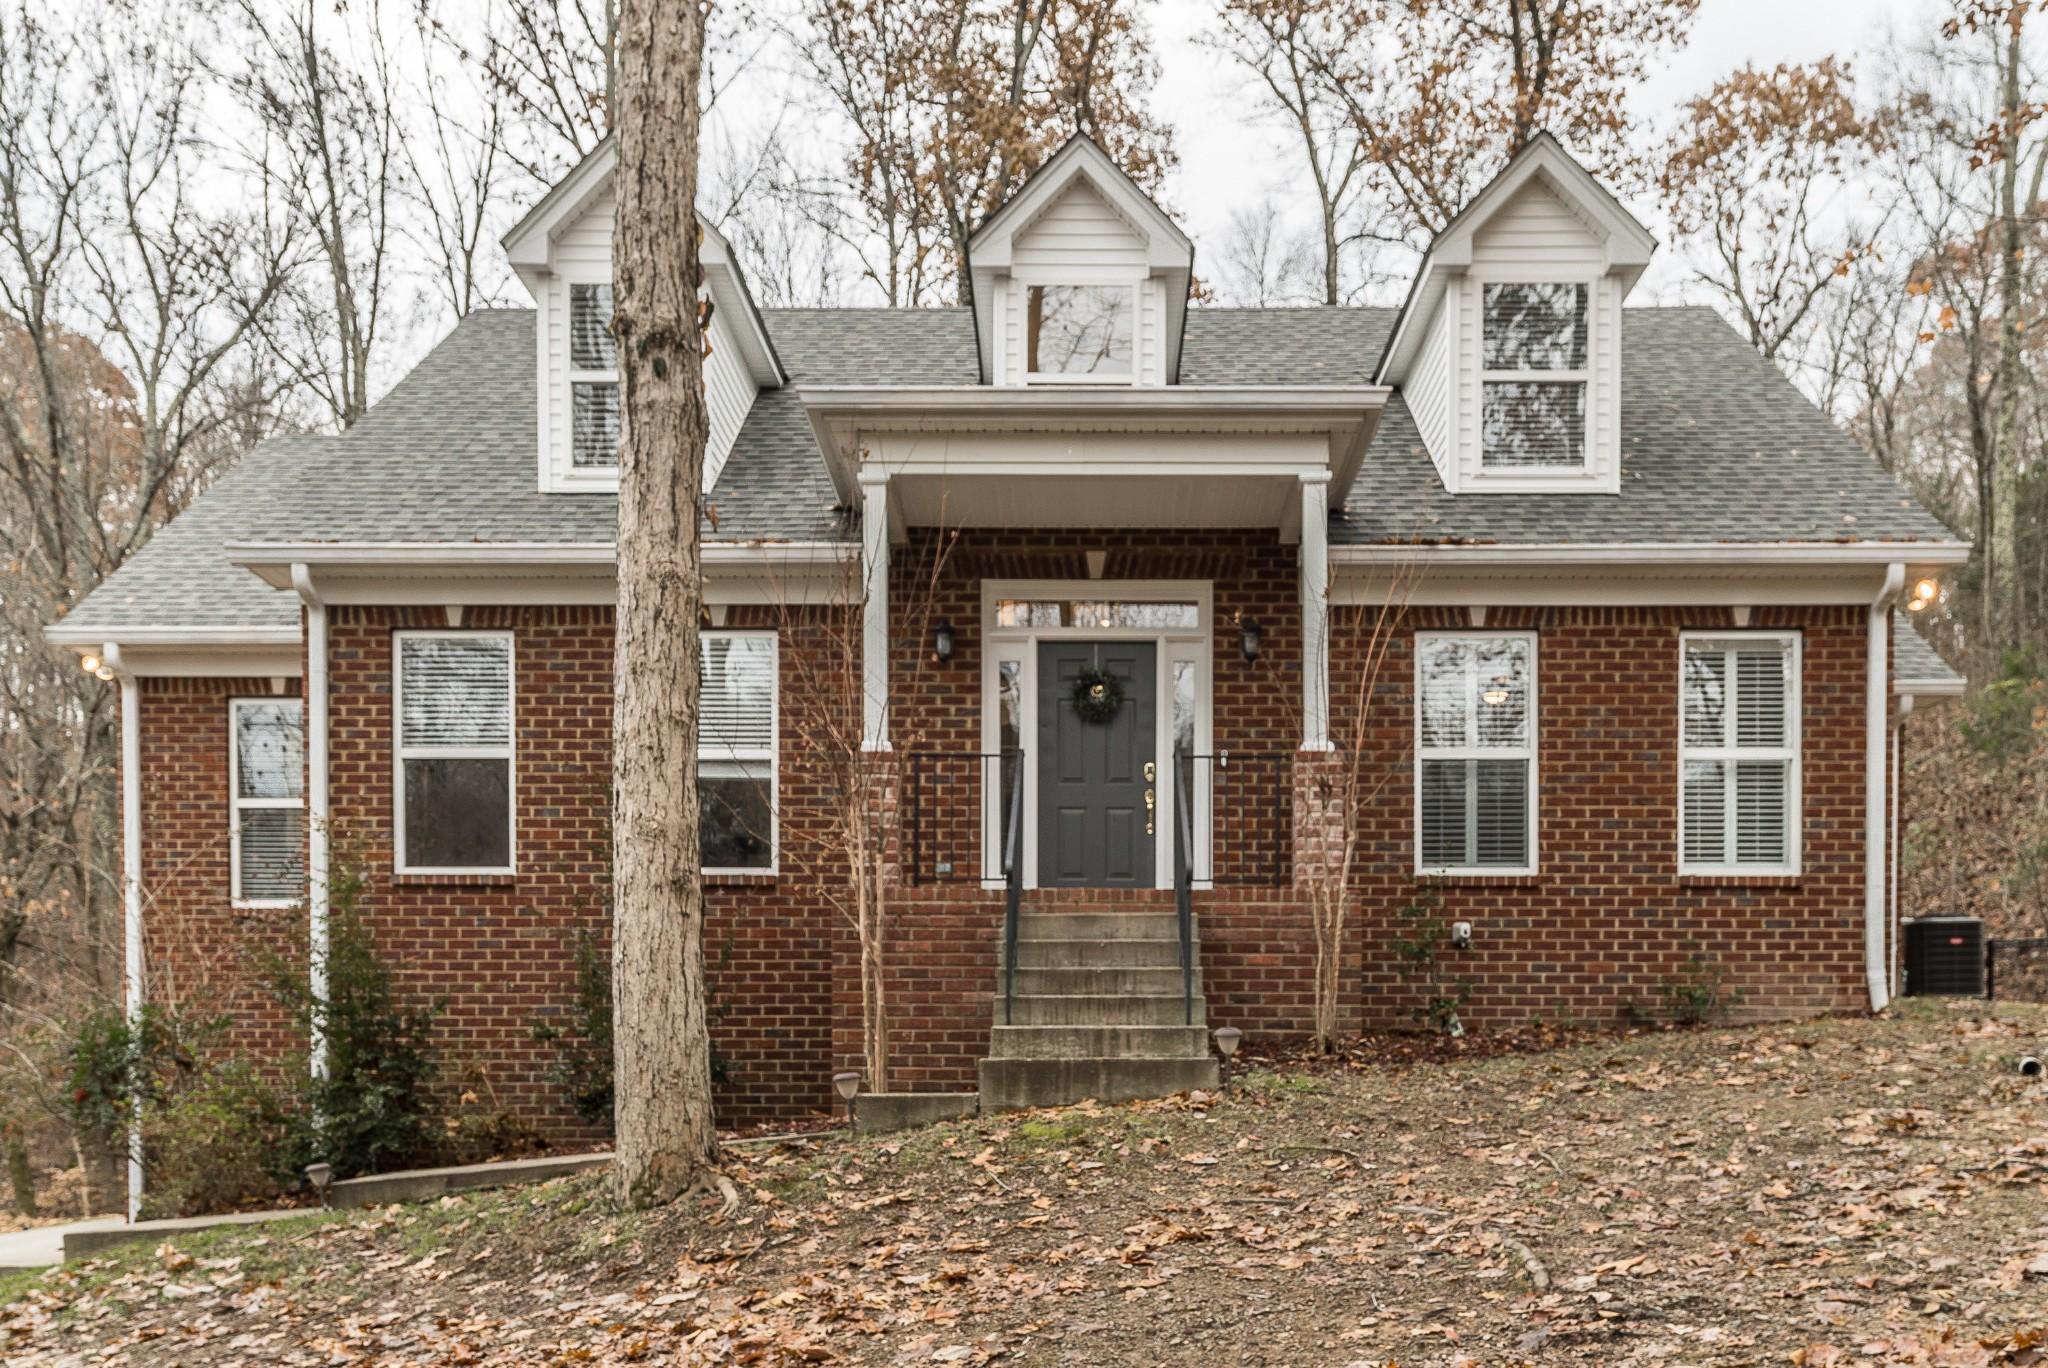 $419,900 - 3Br/3Ba -  for Sale in Langbrae Estates, Goodlettsville